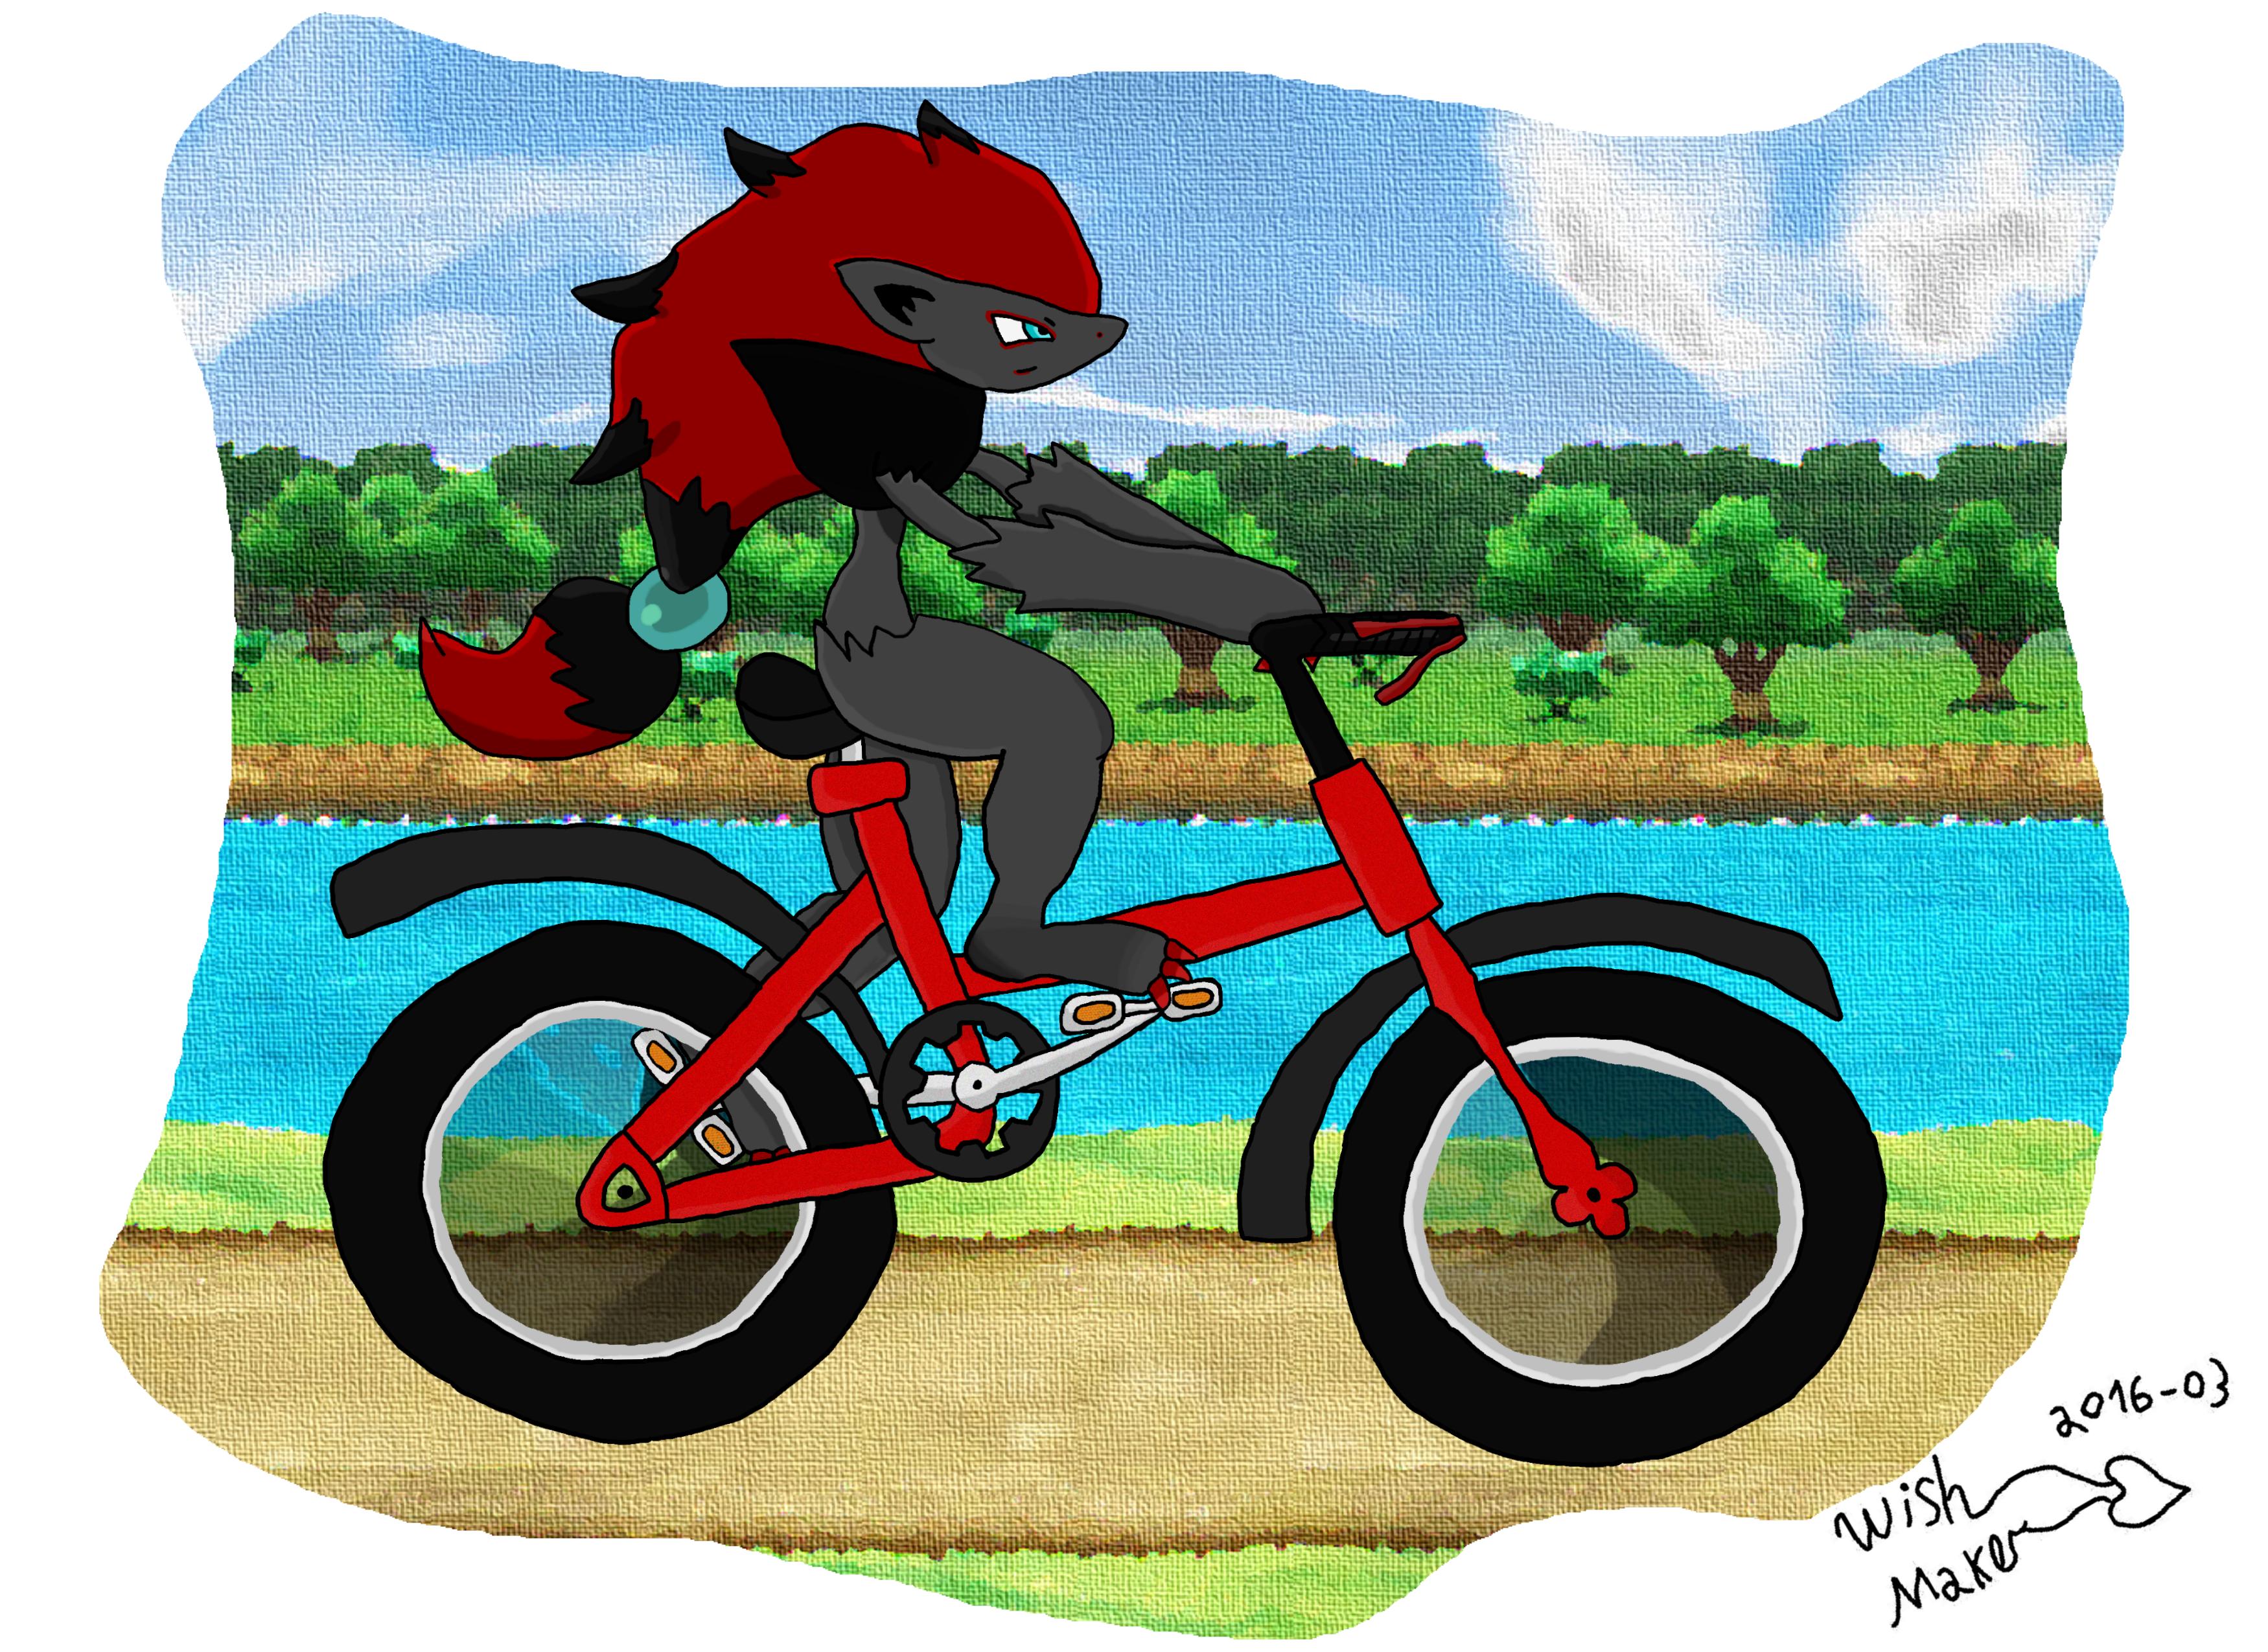 Zoroark Cycling